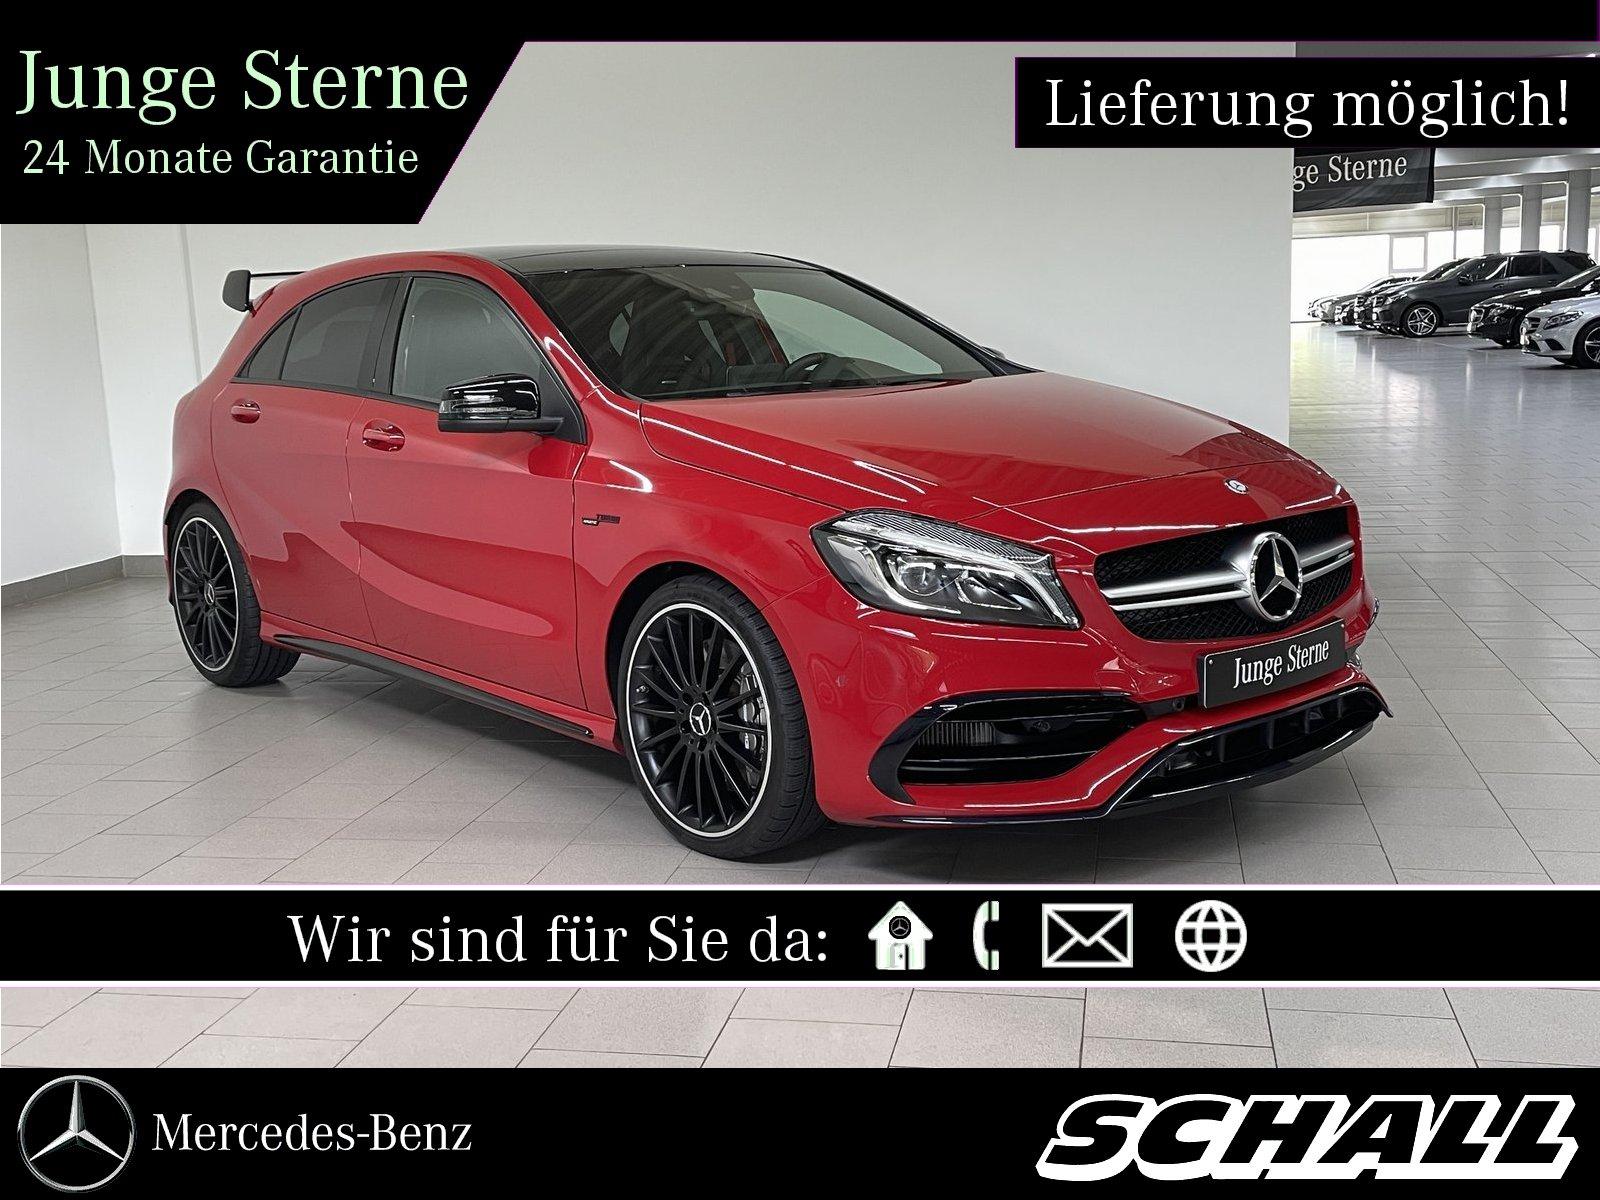 Mercedes-Benz A 45 4M AMG PERF.SITZE+PERF.ABGAS+NIGHT+PANO+KAM, Jahr 2015, Benzin